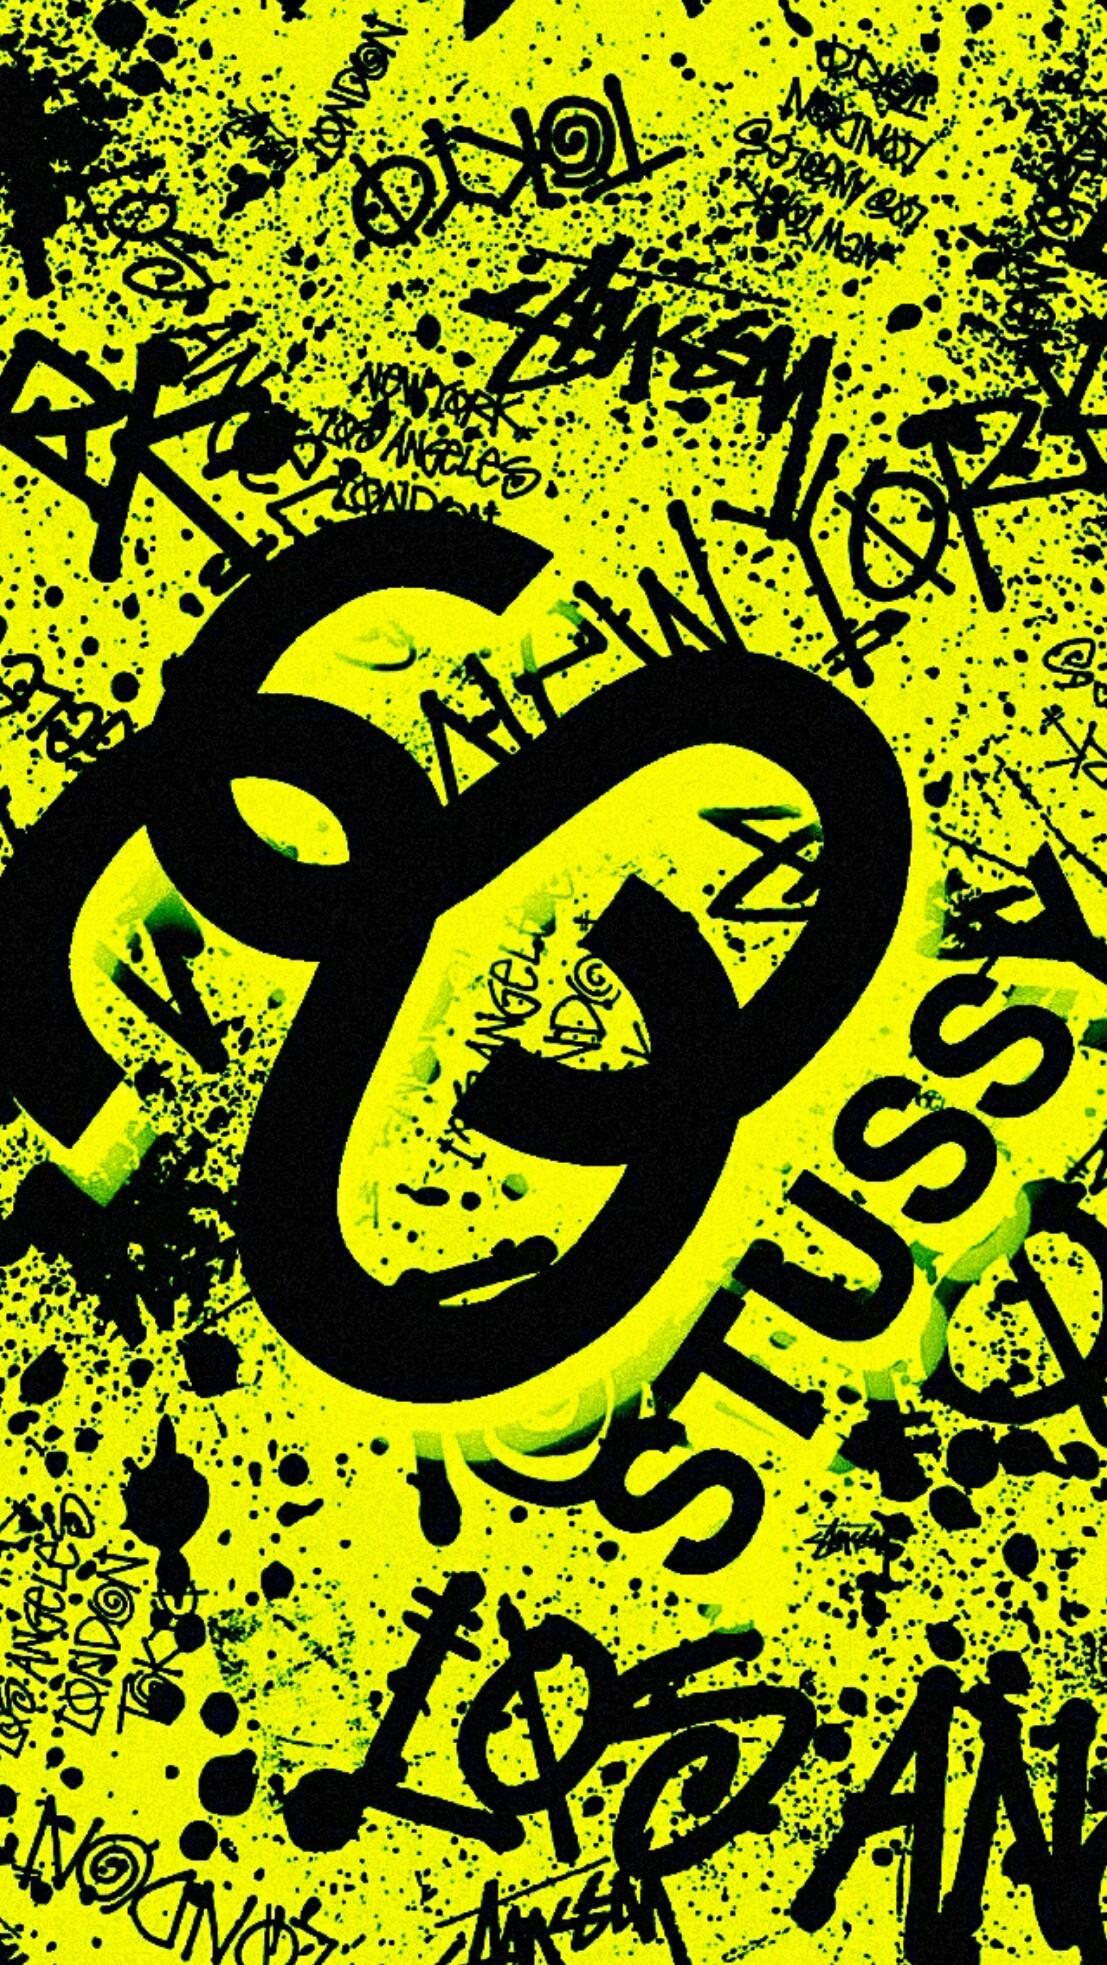 Black And Yellow Supreme Wallpaper